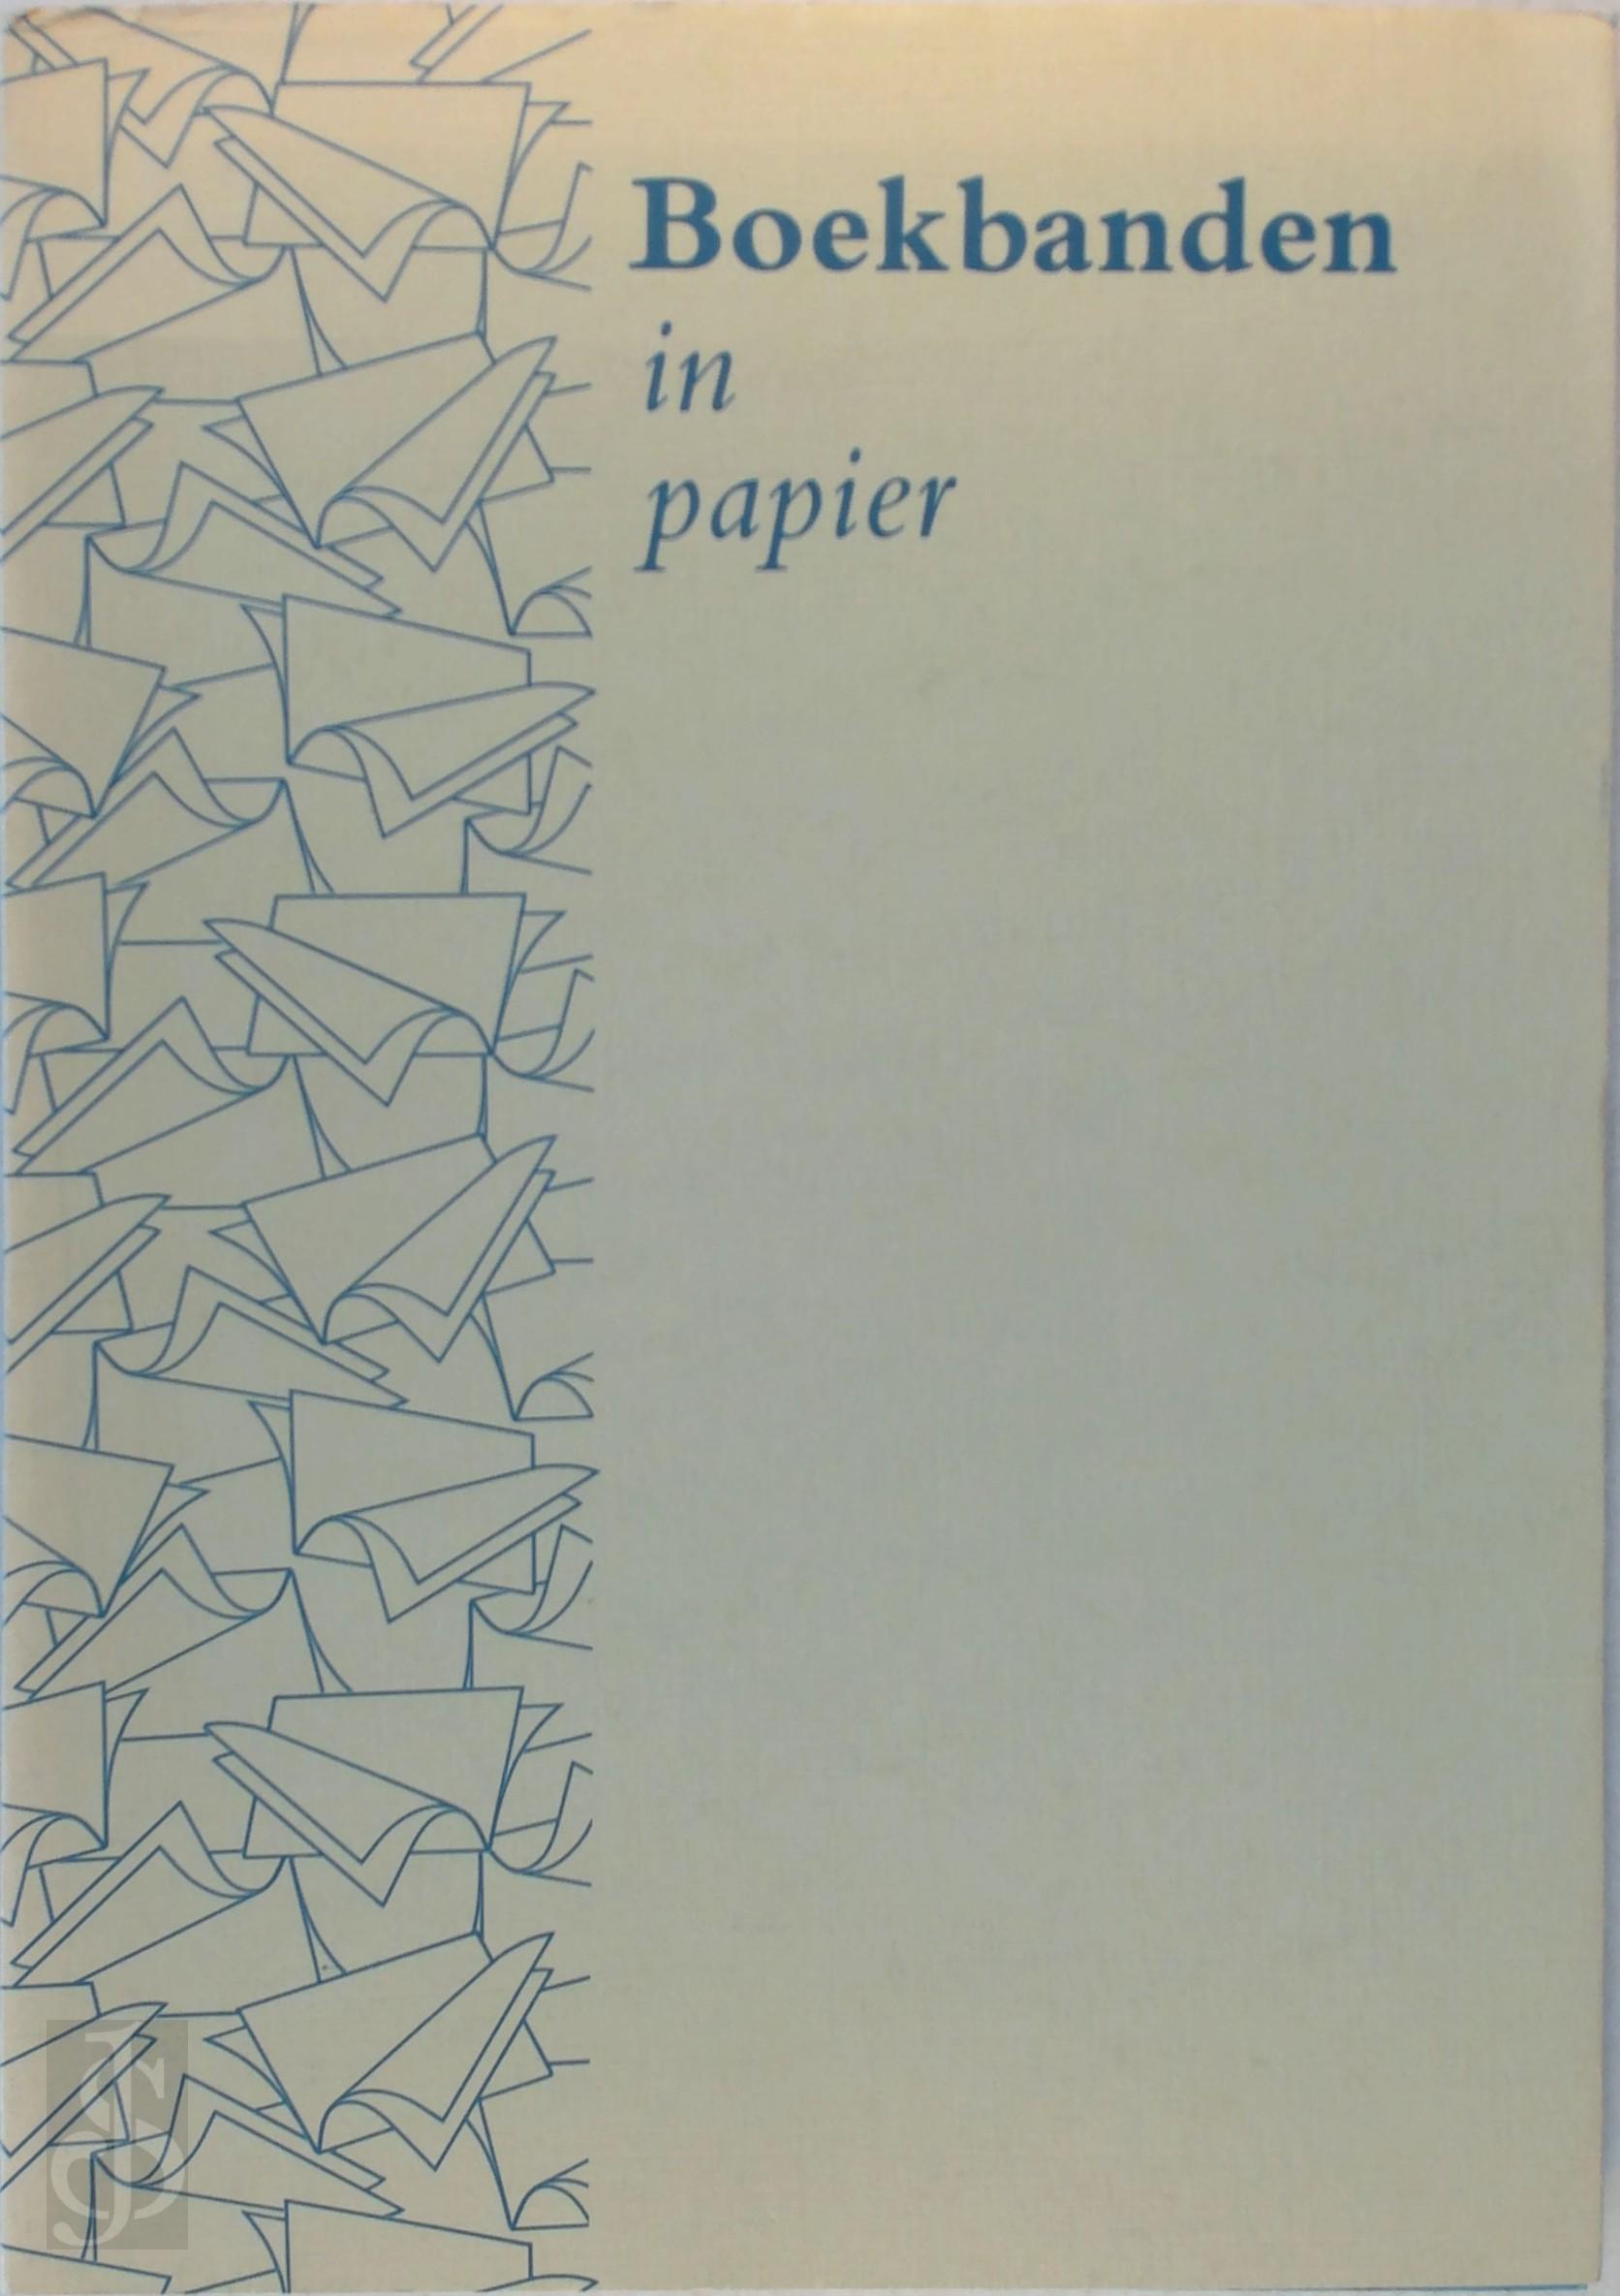 Boekbanden in papier nation...